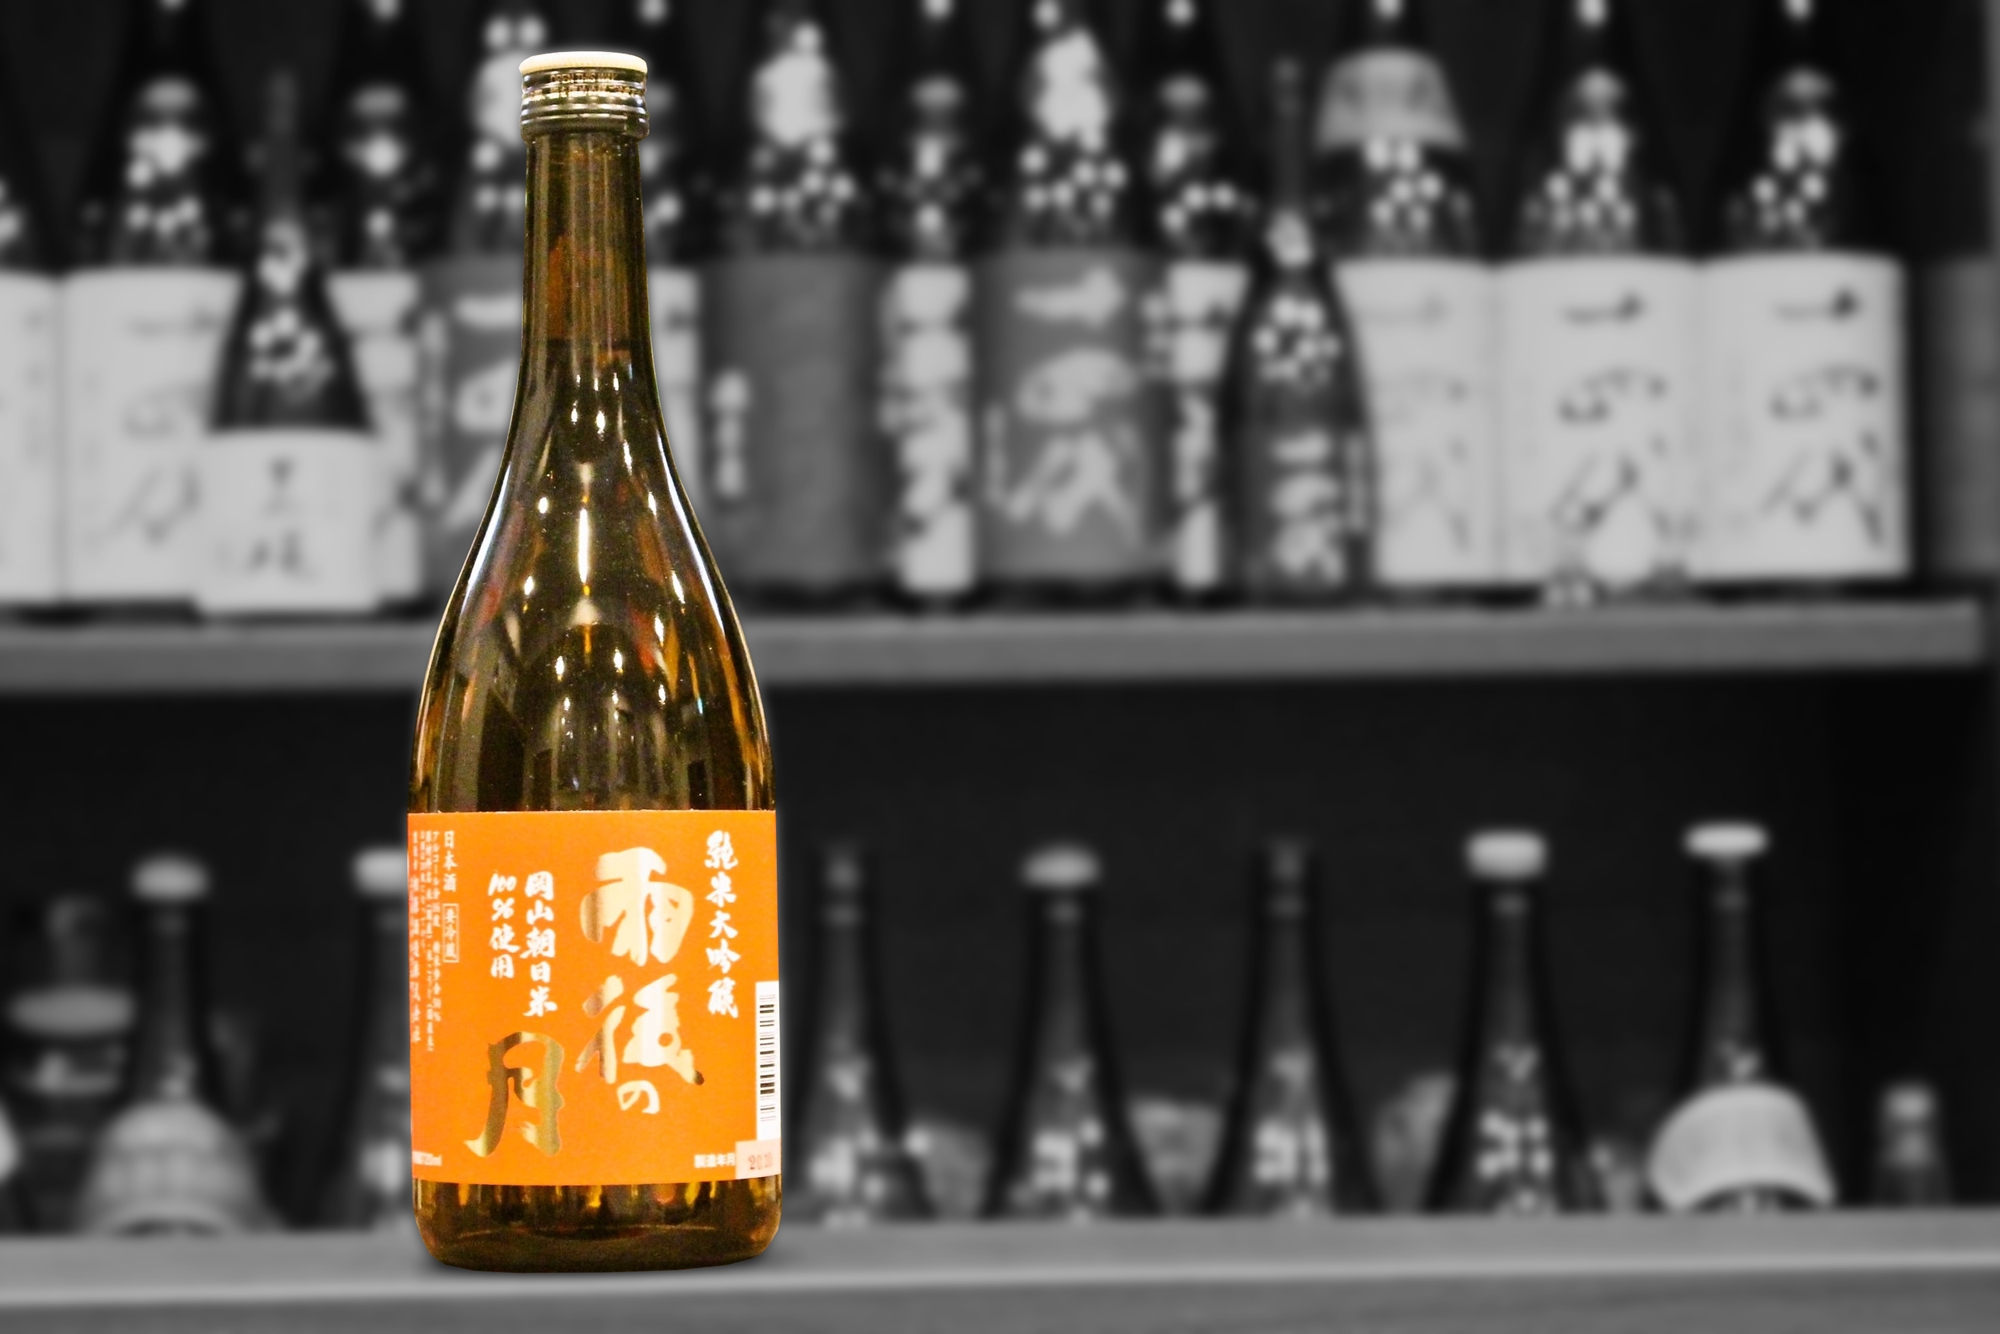 雨後の月純米大吟醸朝日202101-001